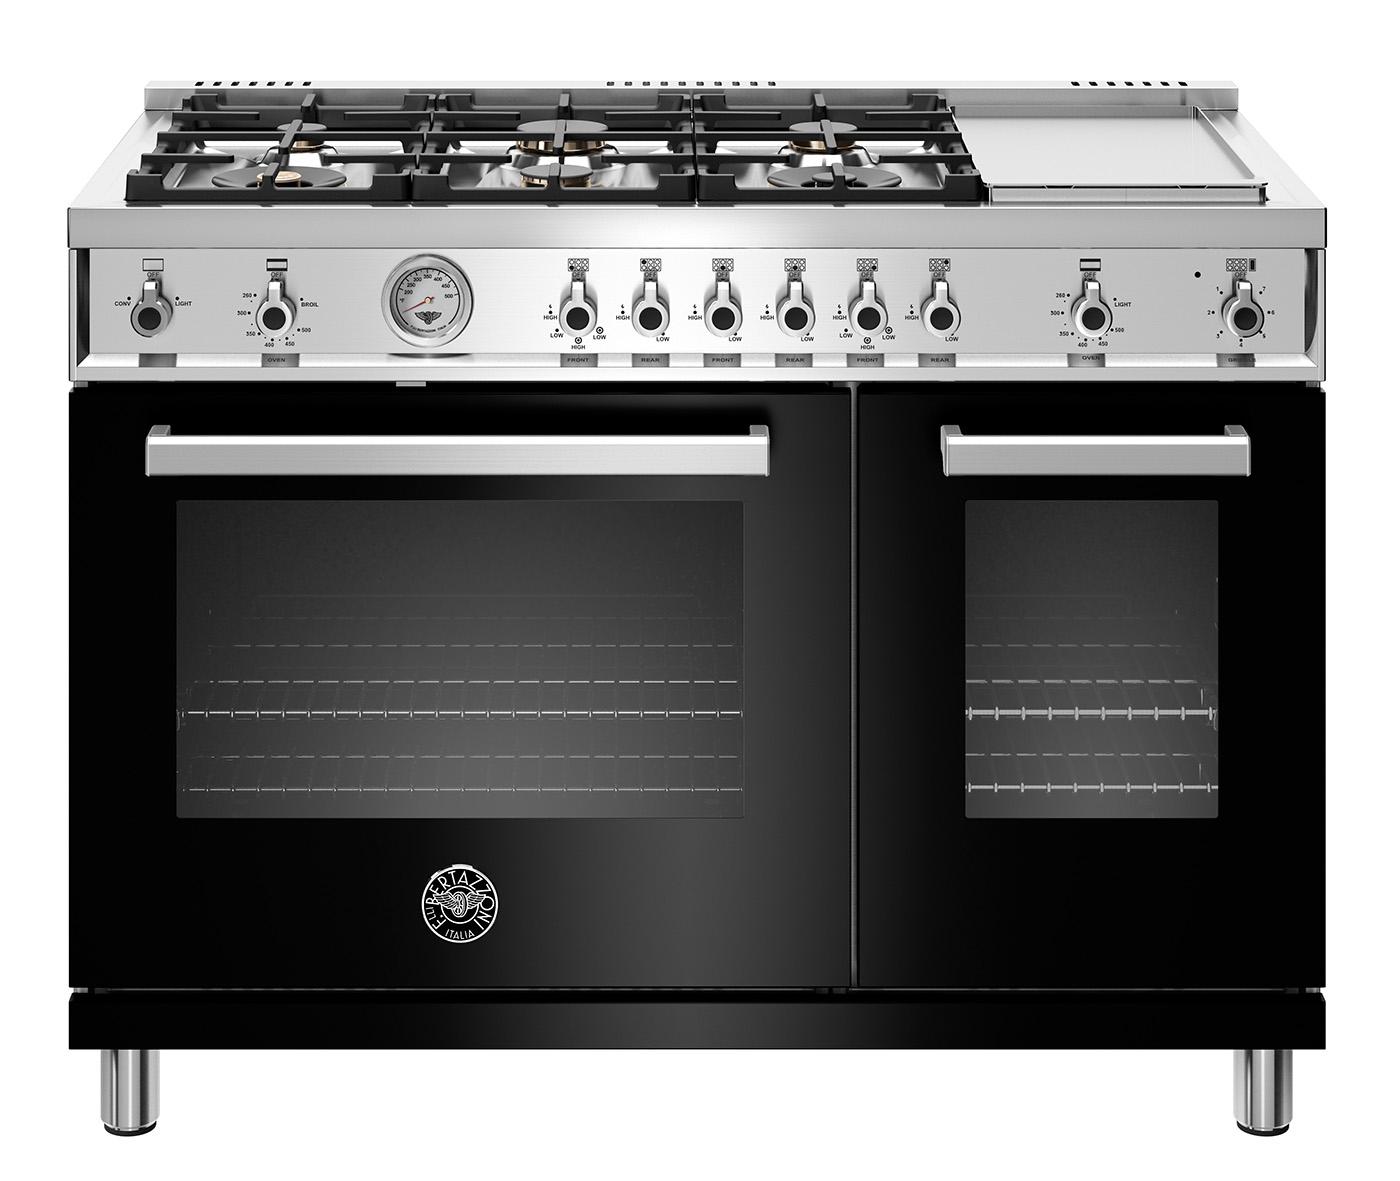 "Model: PROF486GGASNET | Bertazzoni 48"" Professional Series range - Gas Oven - 6 brass burners + griddle"